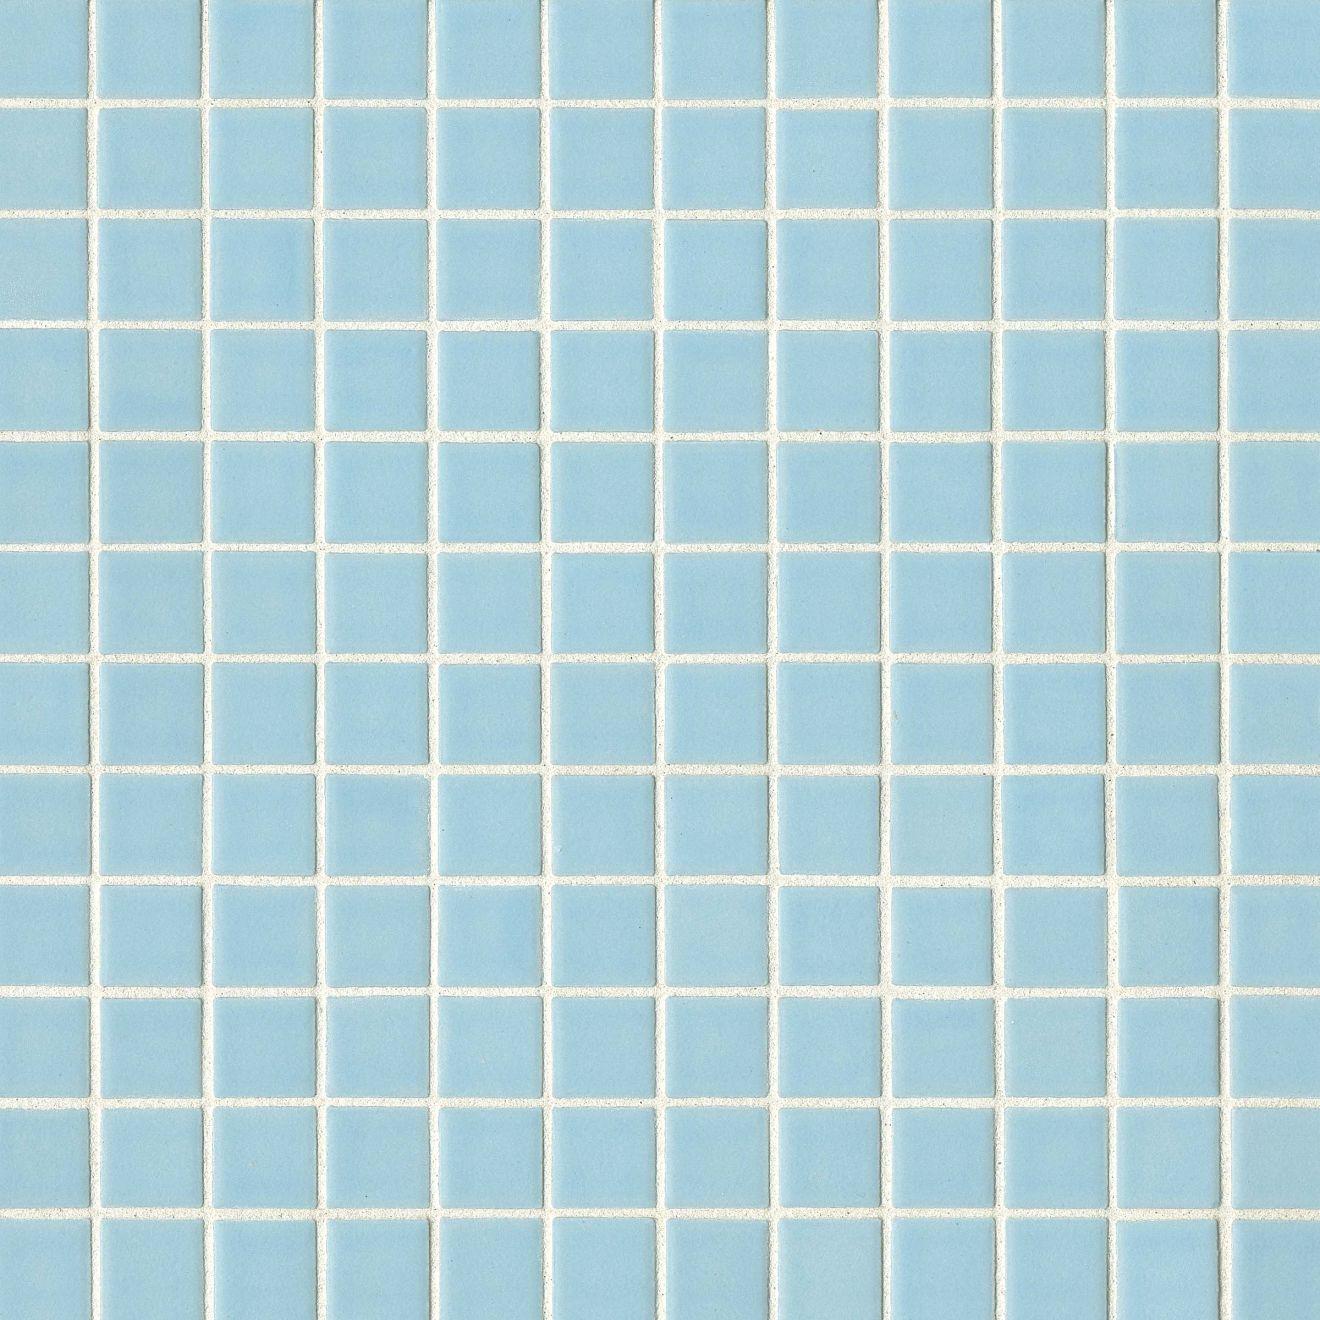 "True 1"" x 1"" Floor & Wall Mosaic in Sky"